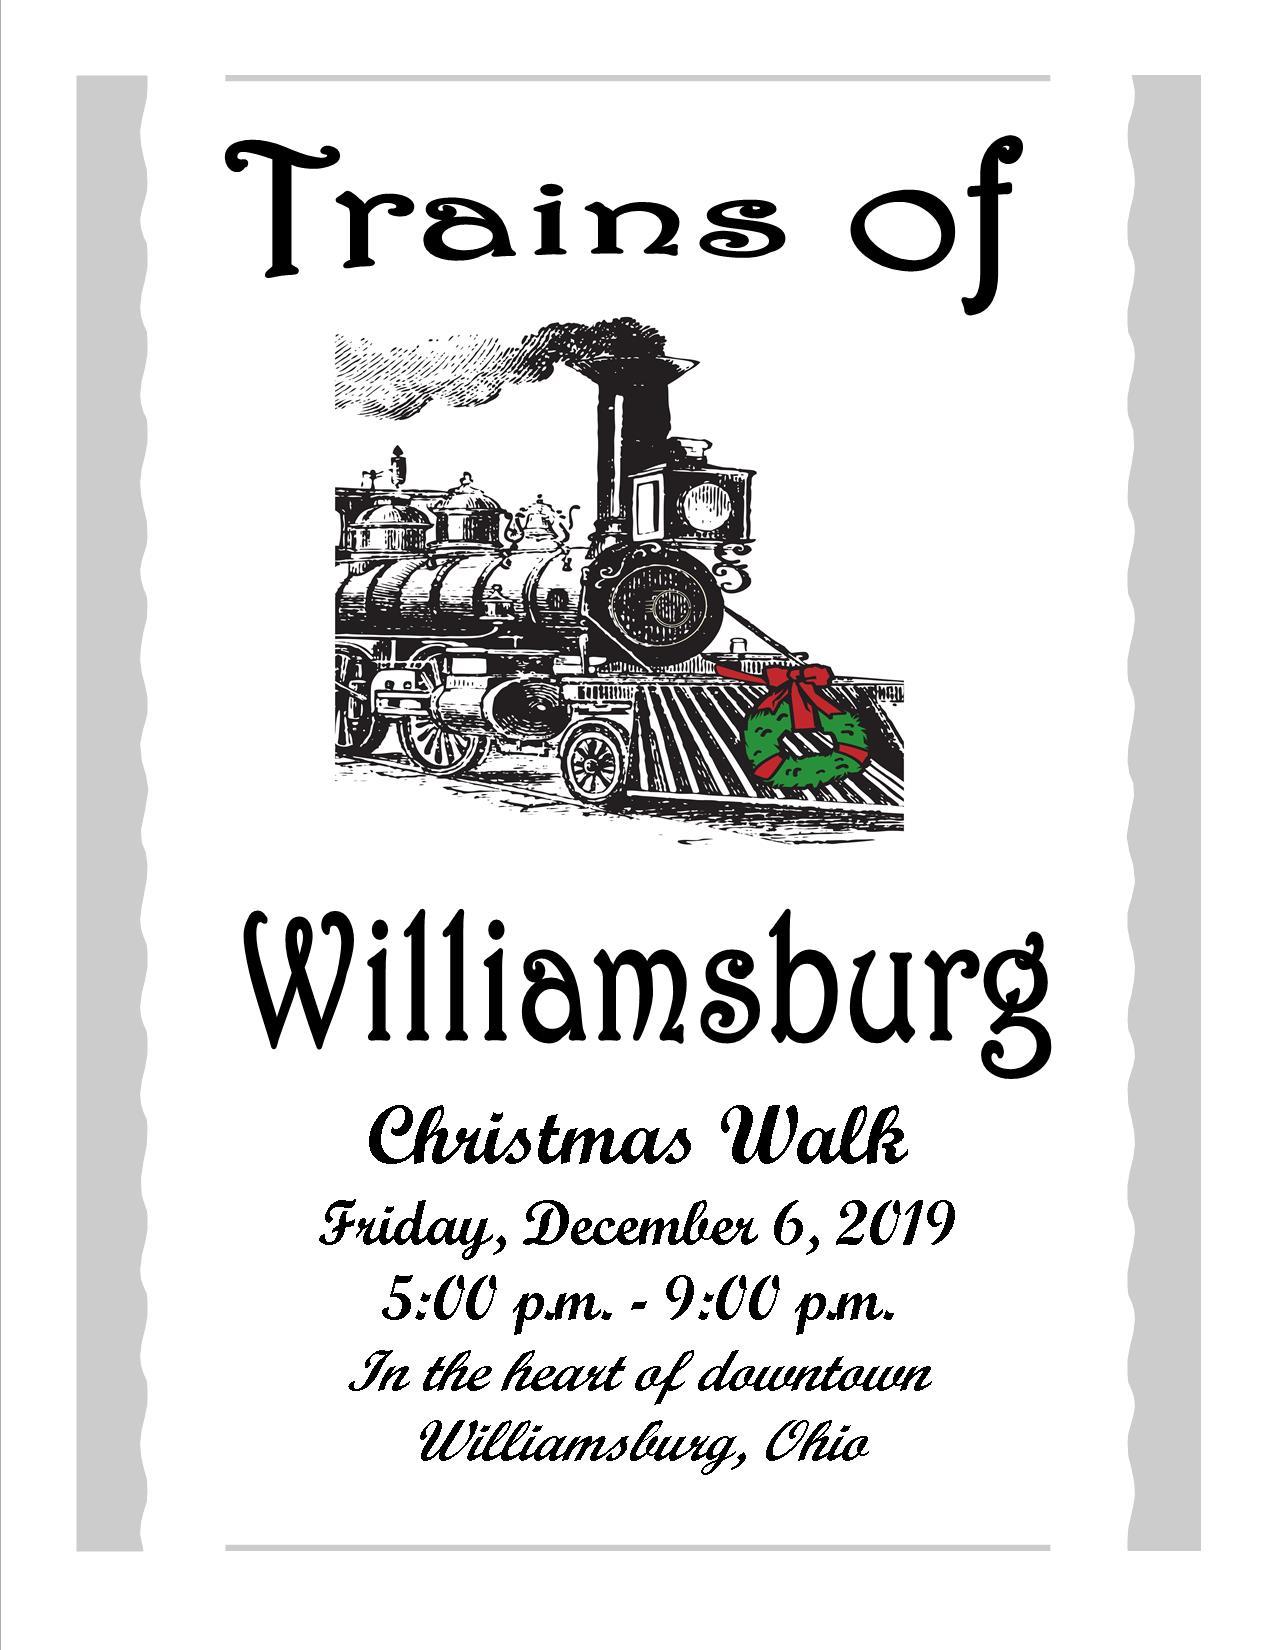 Williamsburg Christmas 2019.The Trains Of Williamsburg Christmas Walk 2019